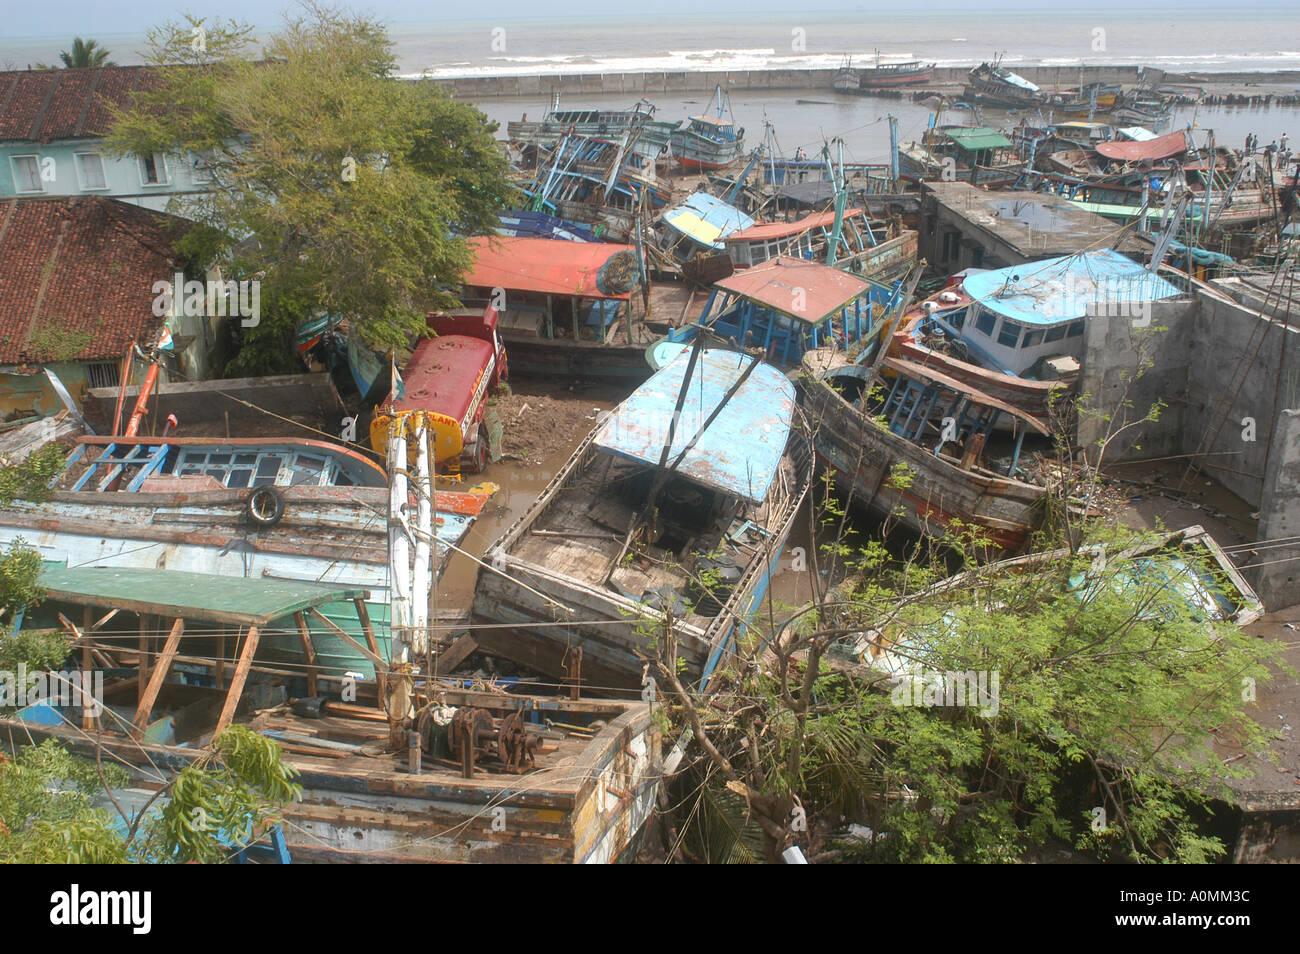 Boats on land by natural disaster Tsunami earthquake on sea floor Nagapattinum Velankanni Tamil Nadu Indian Ocean India - Stock Image